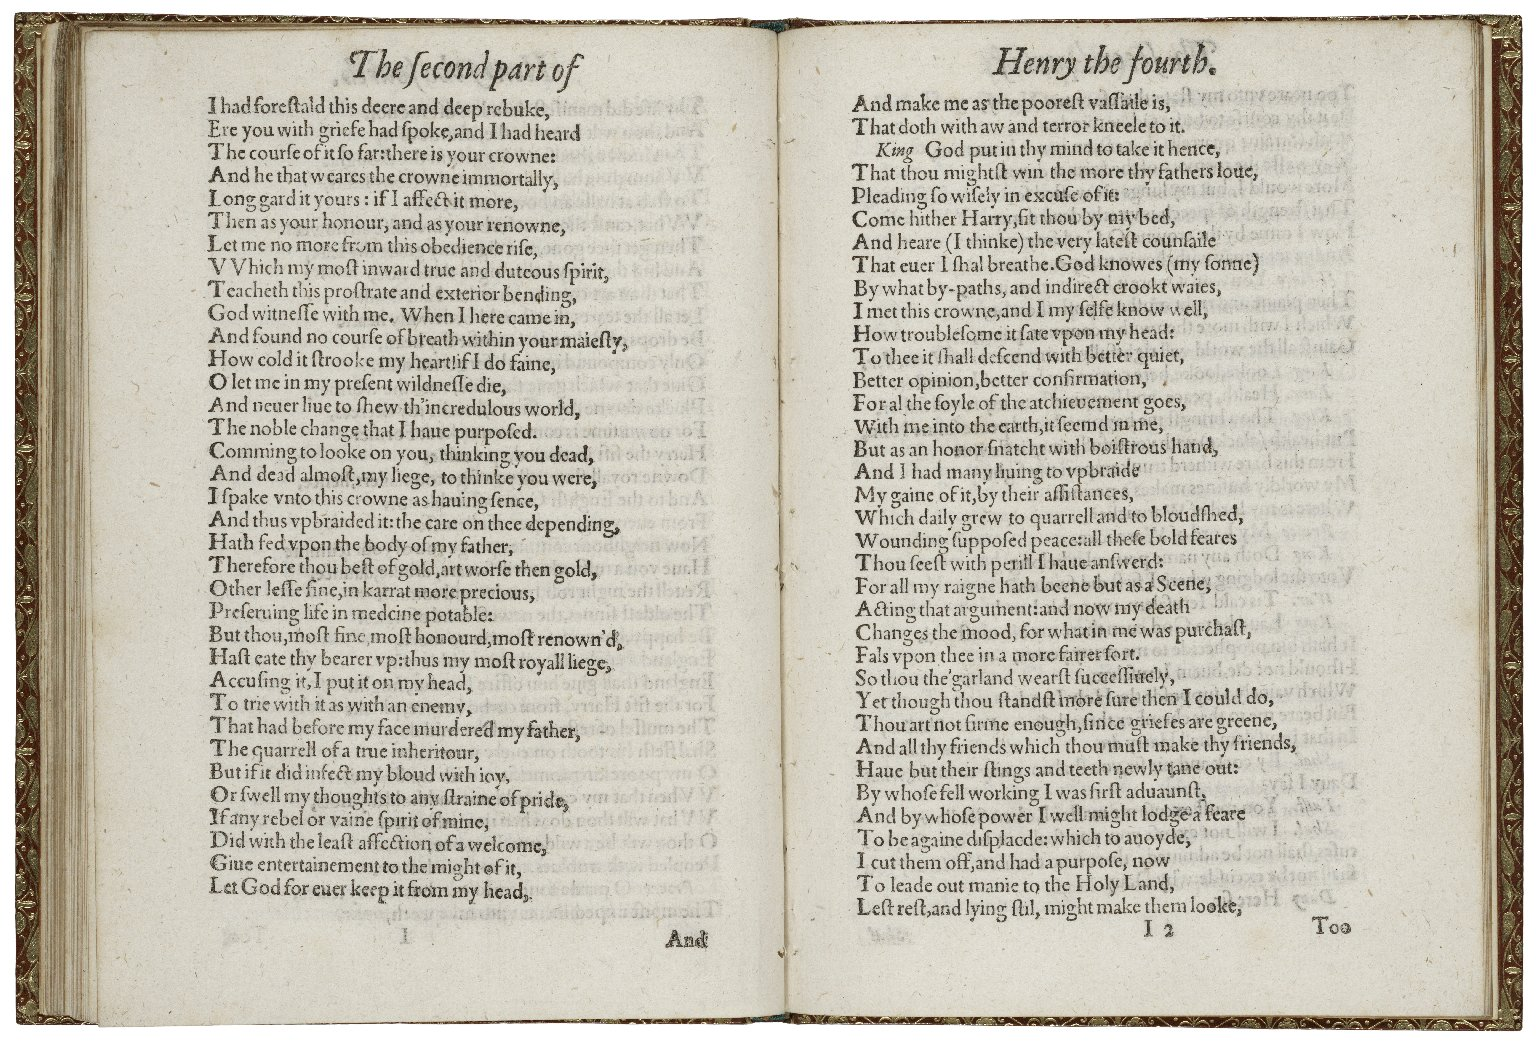 [King Henry IV. Part 2]